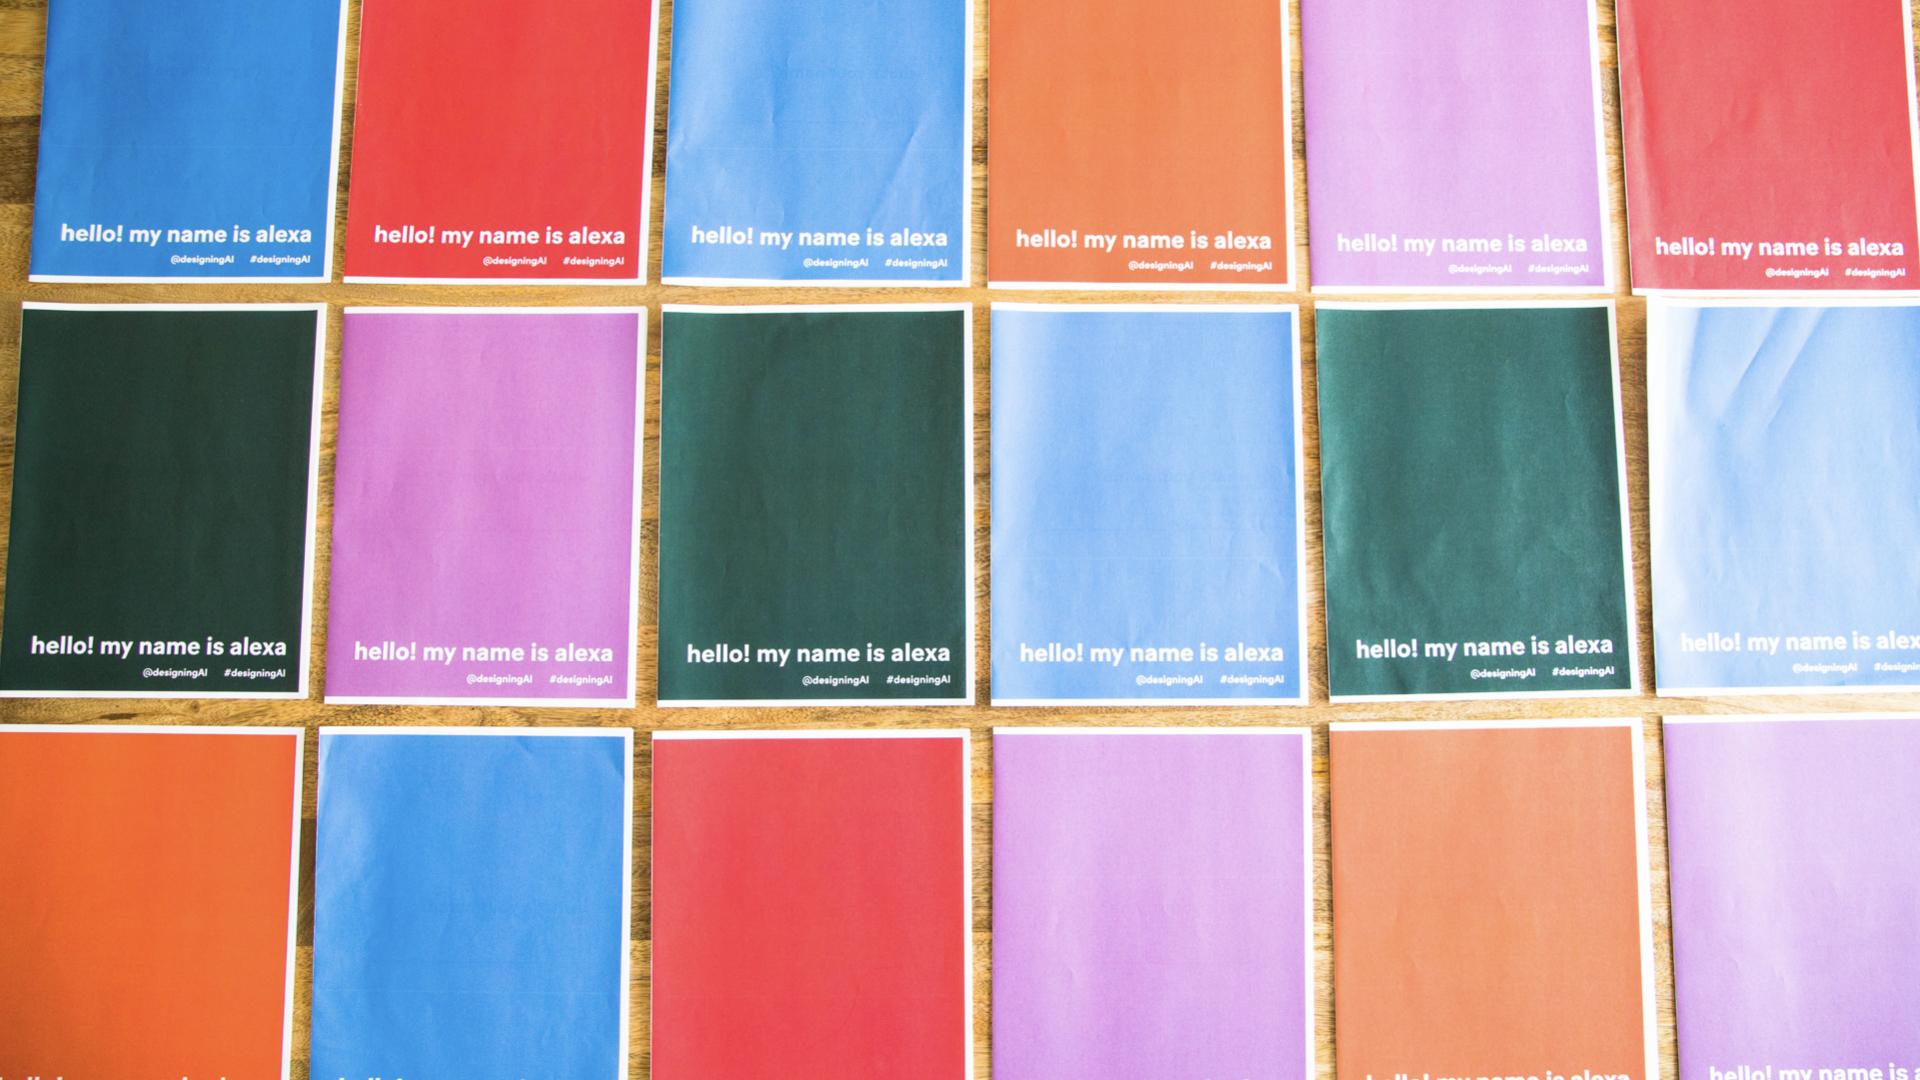 003_alexa-workbooks.jpeg